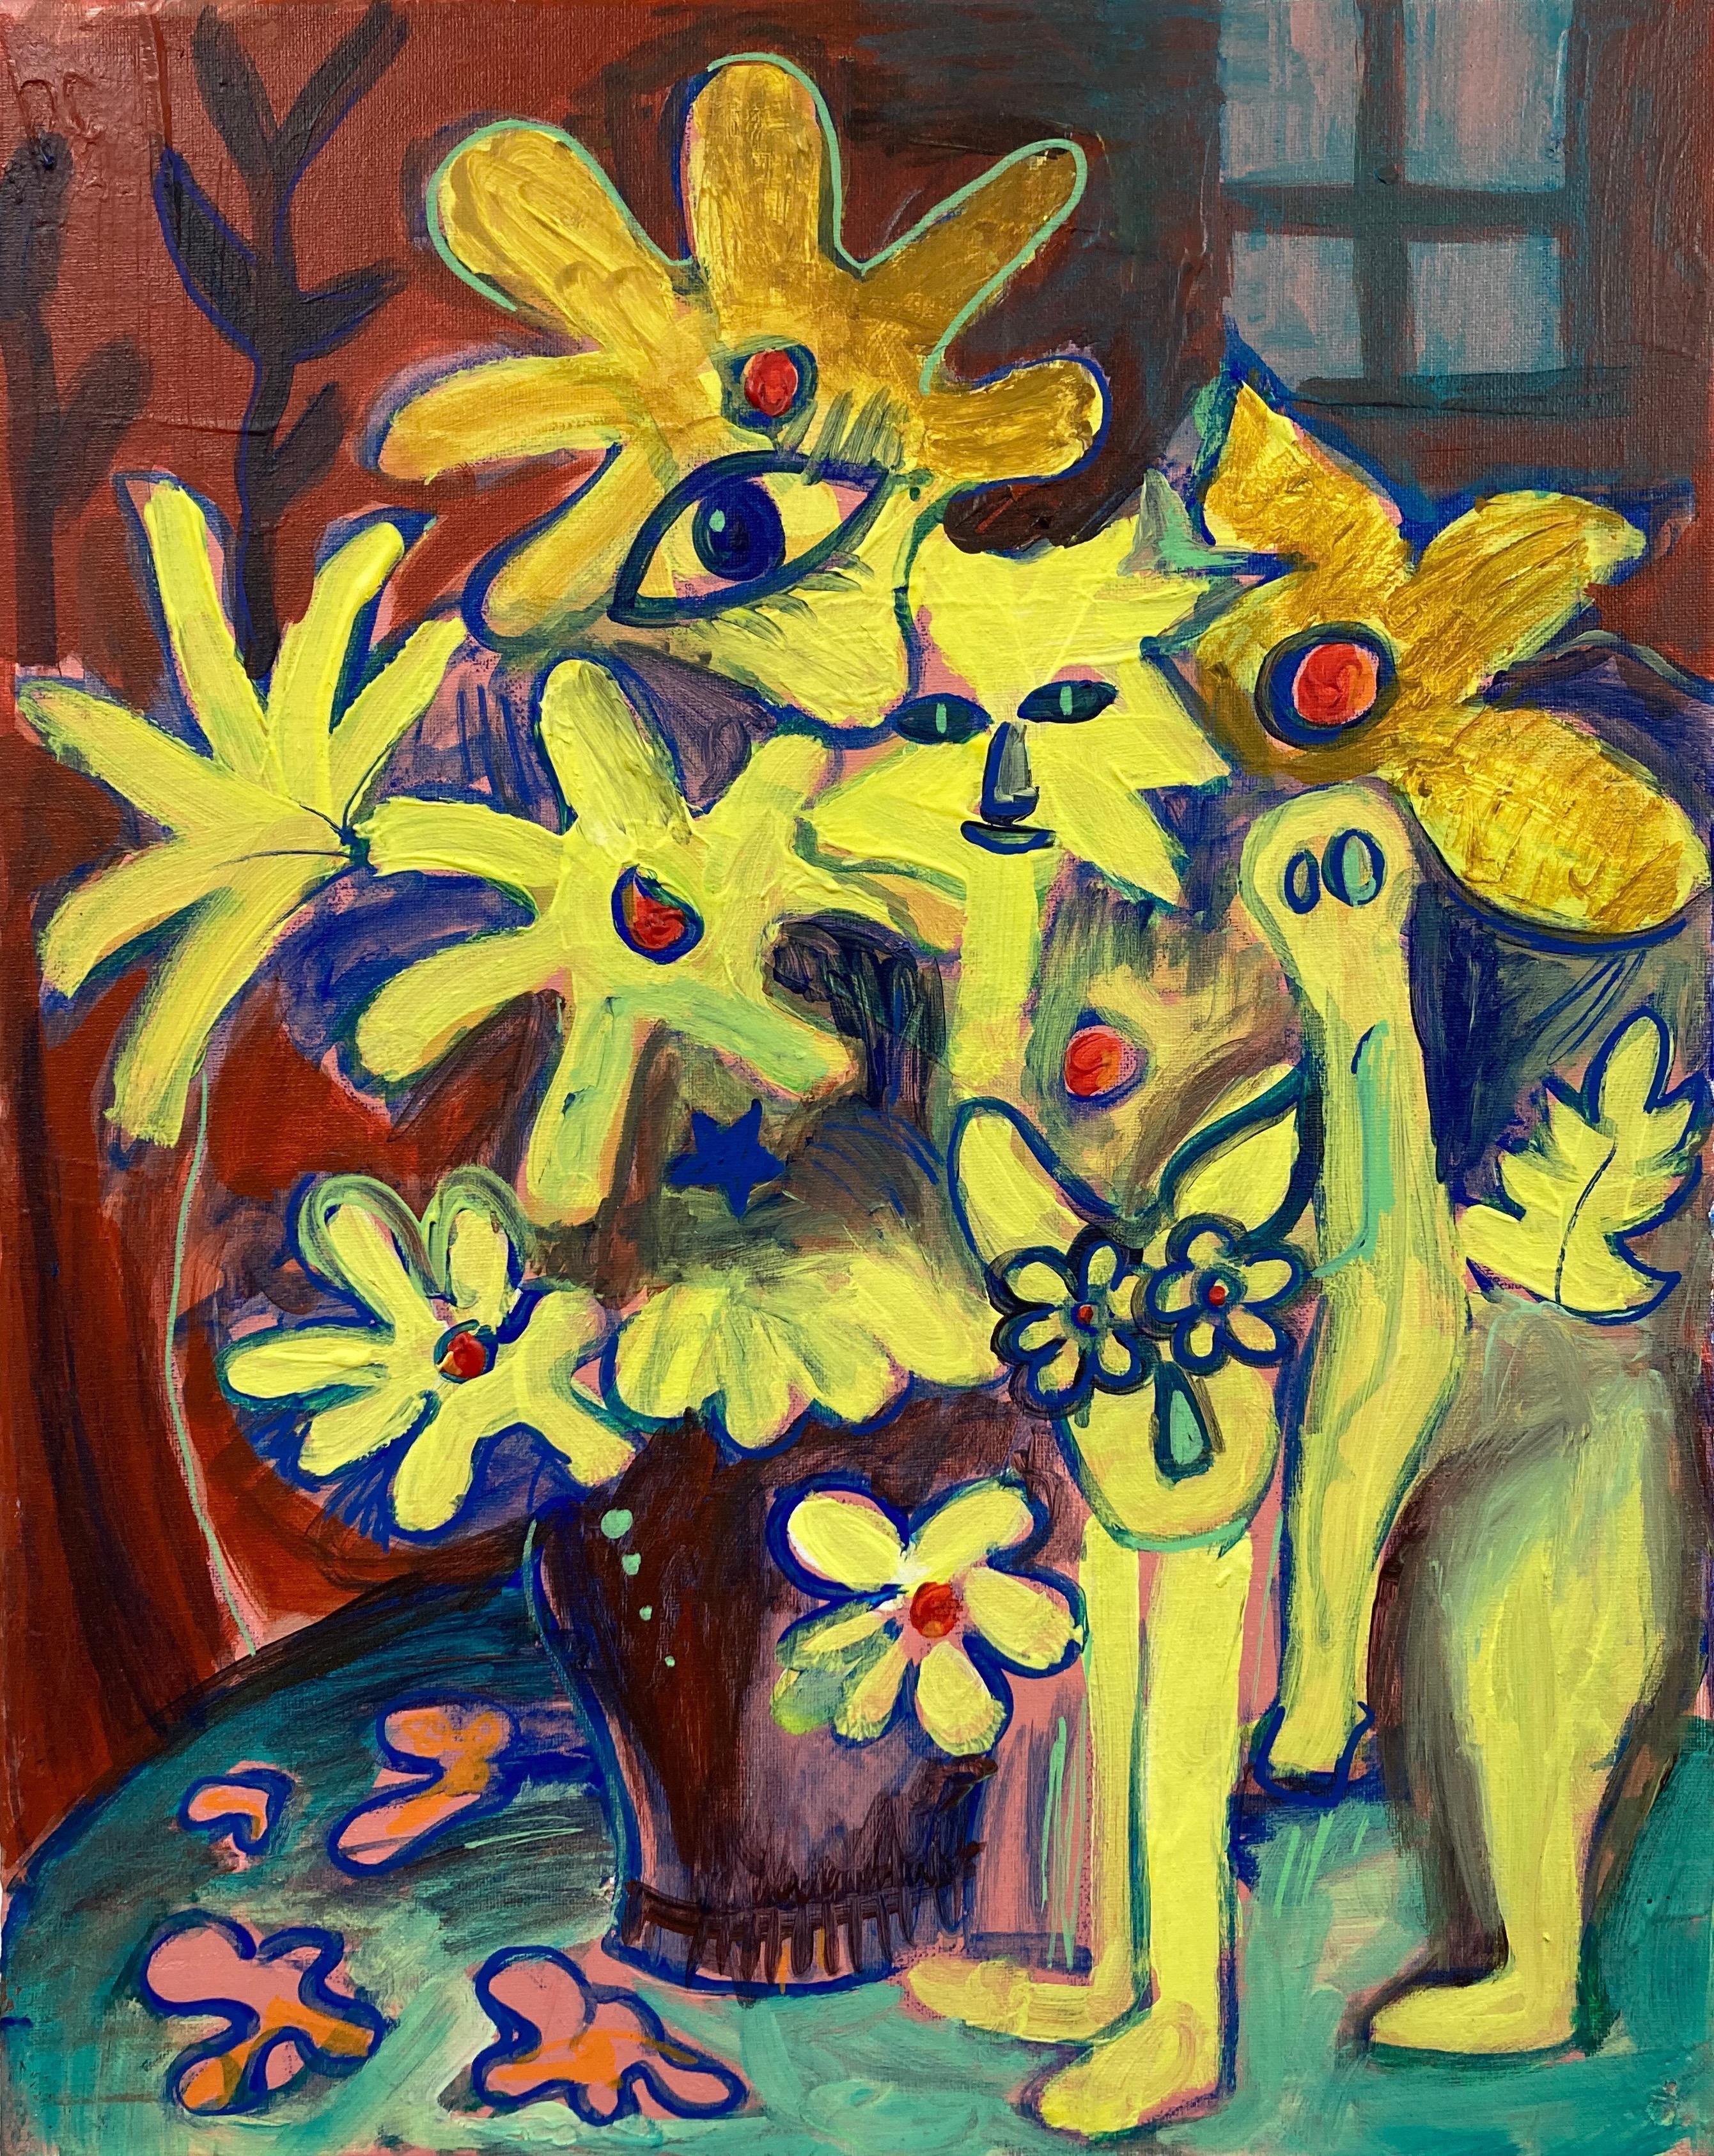 https://0201.nccdn.net/1_2/000/000/0b2/0ec/keeshan_judi_sunny-flowers.jpg